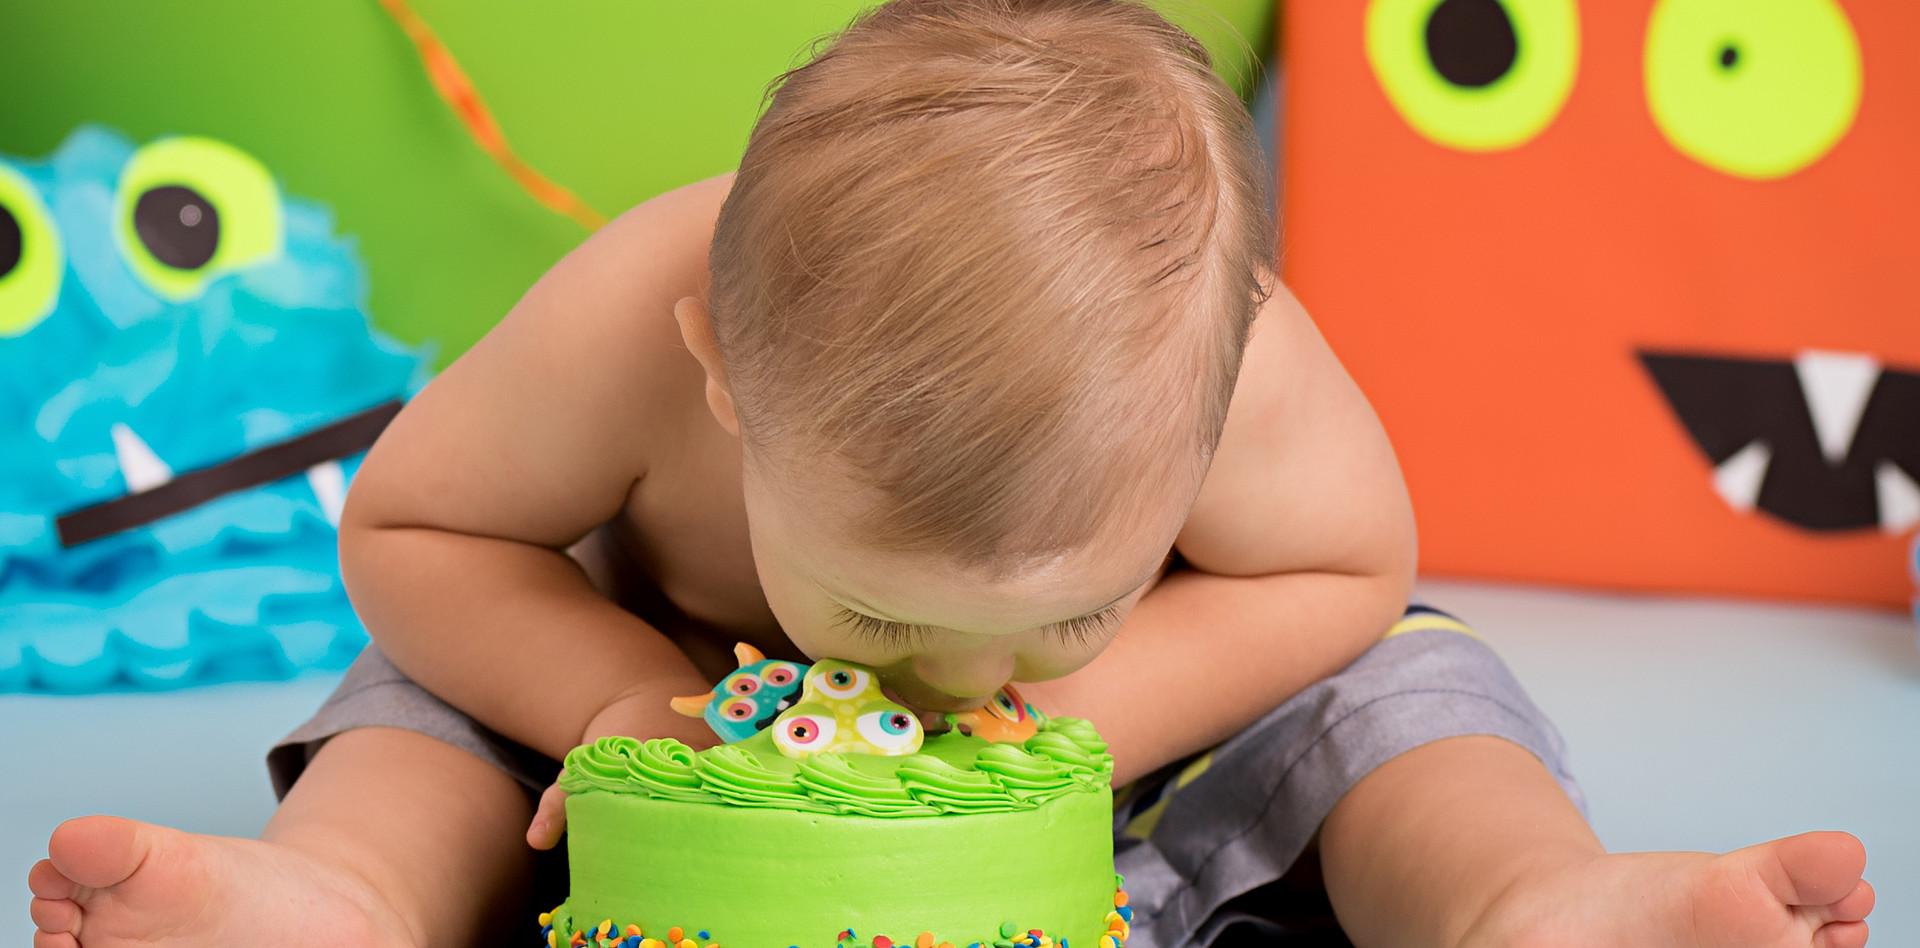 Cake Smash Face Plant